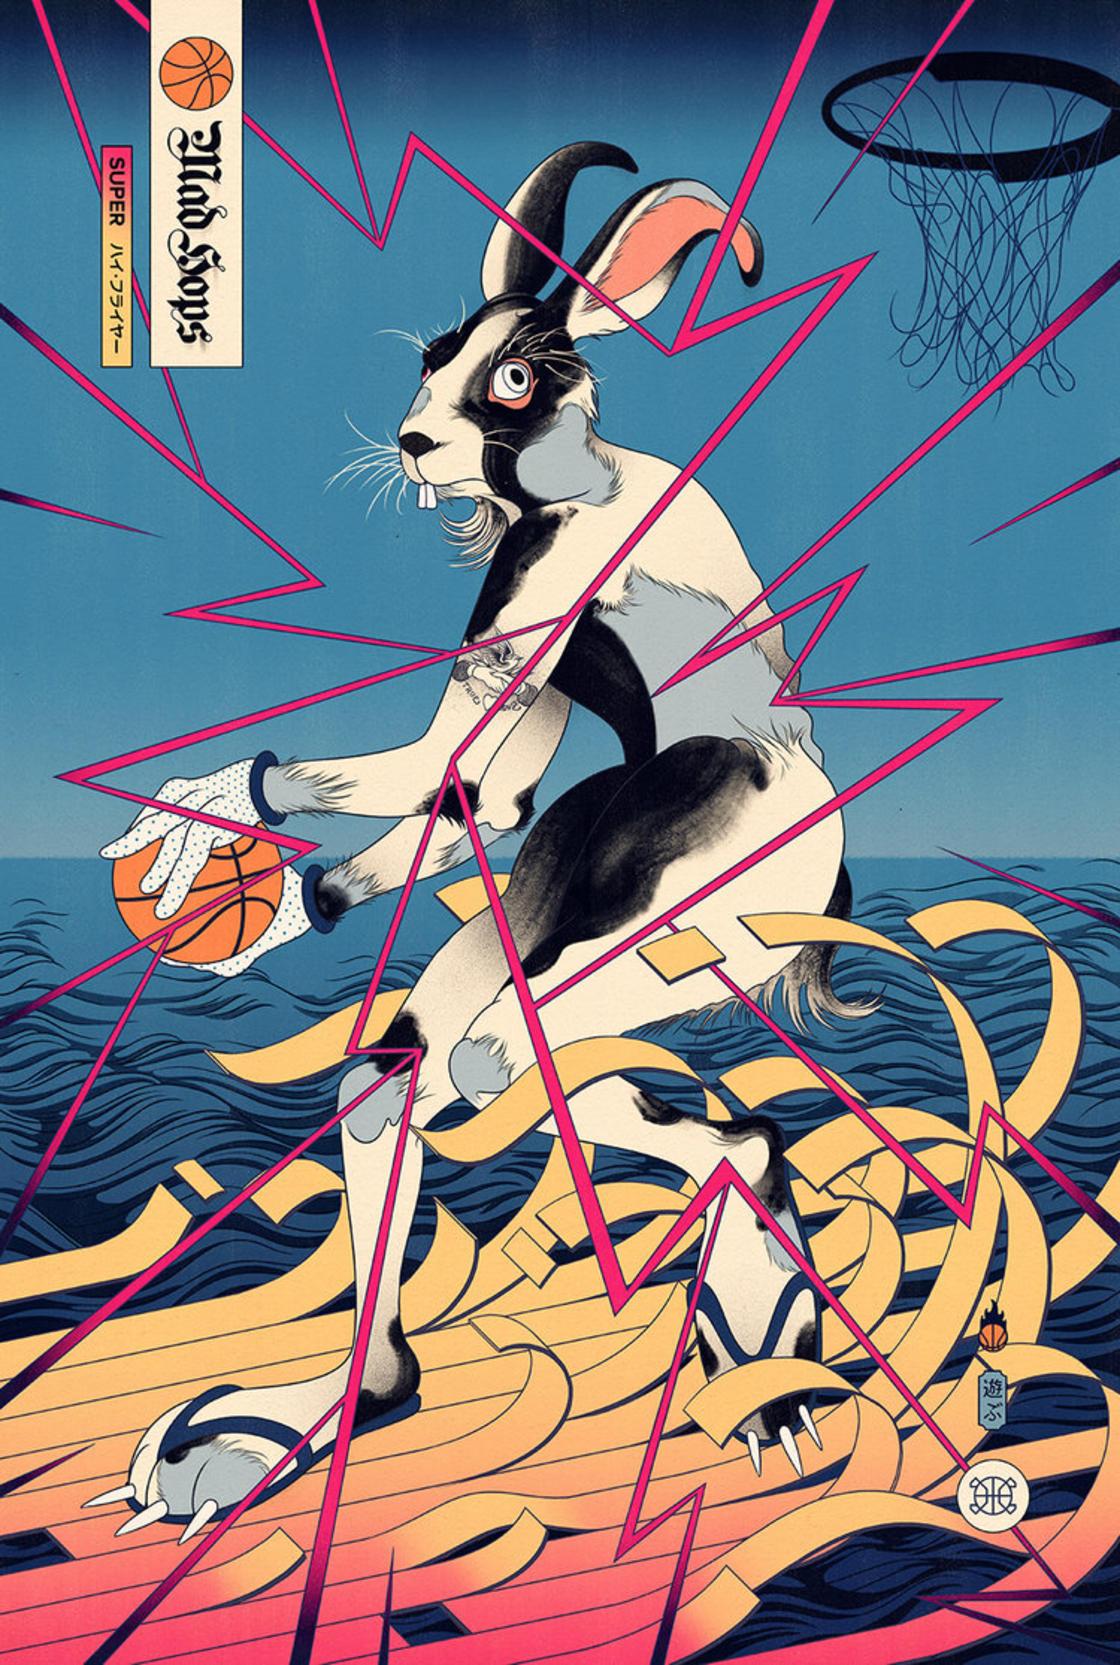 Edo Ball – When modern Basketball meets medieval Japan